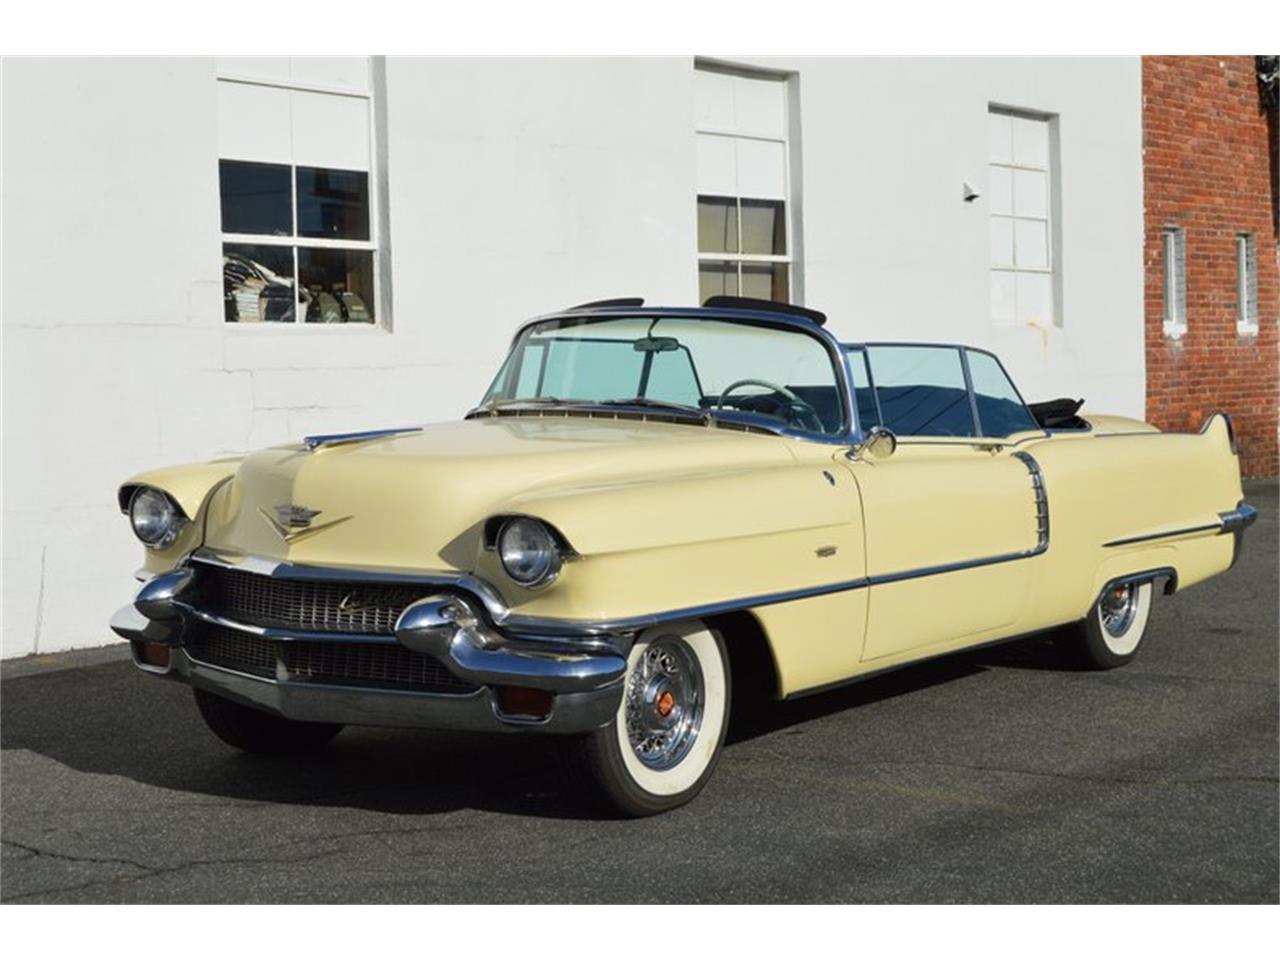 Cadillac Series 62 1956 prix tout compris 1956